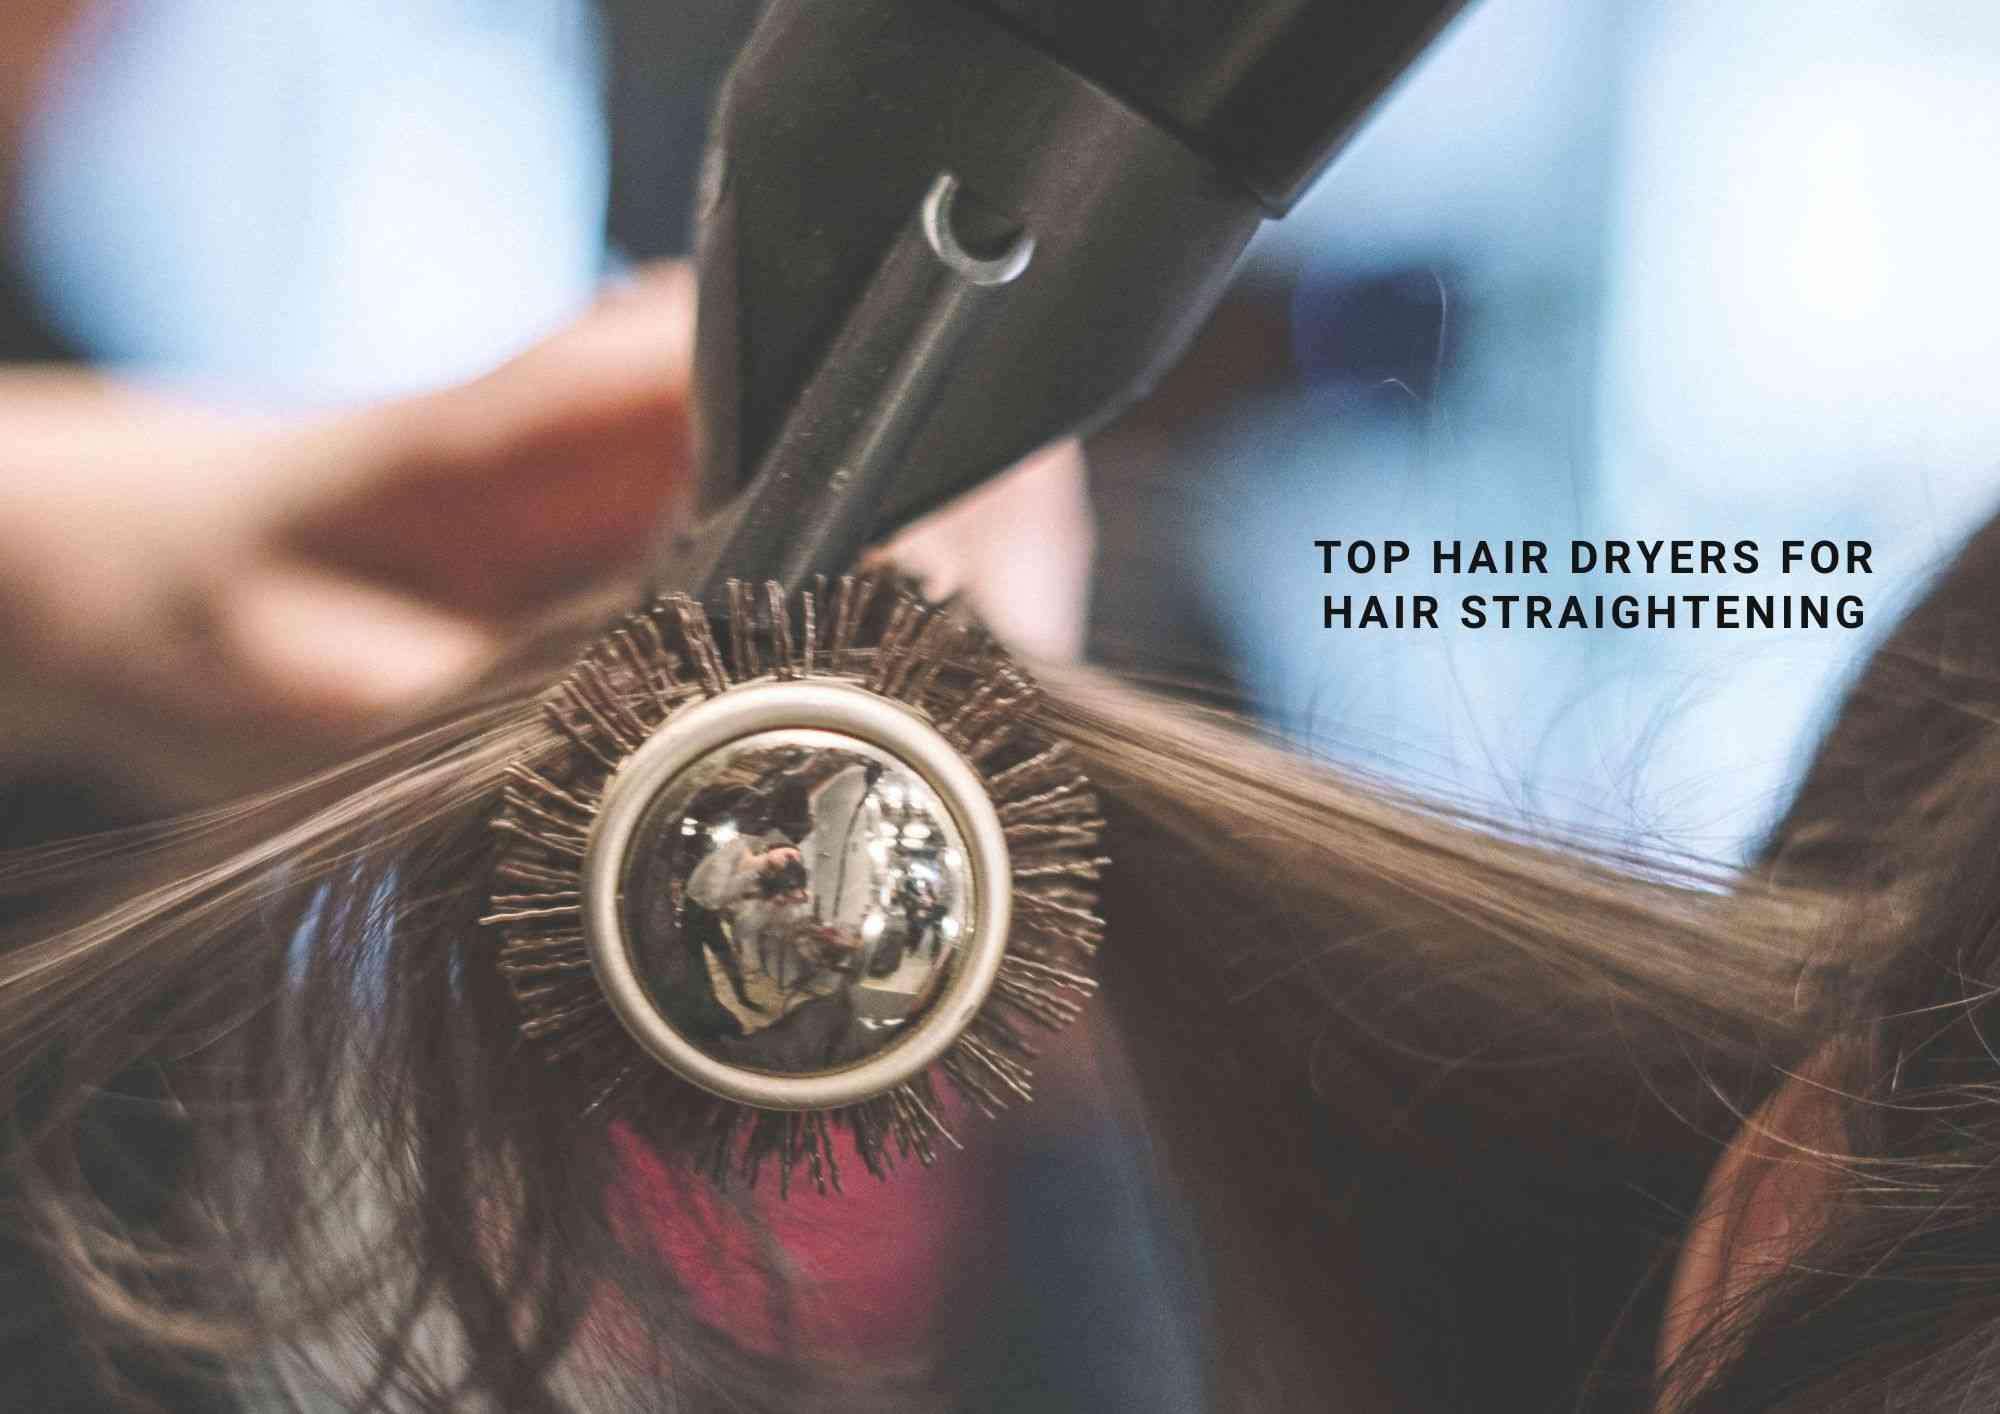 4 Best Hair Dryers For Straightening Hair 2021